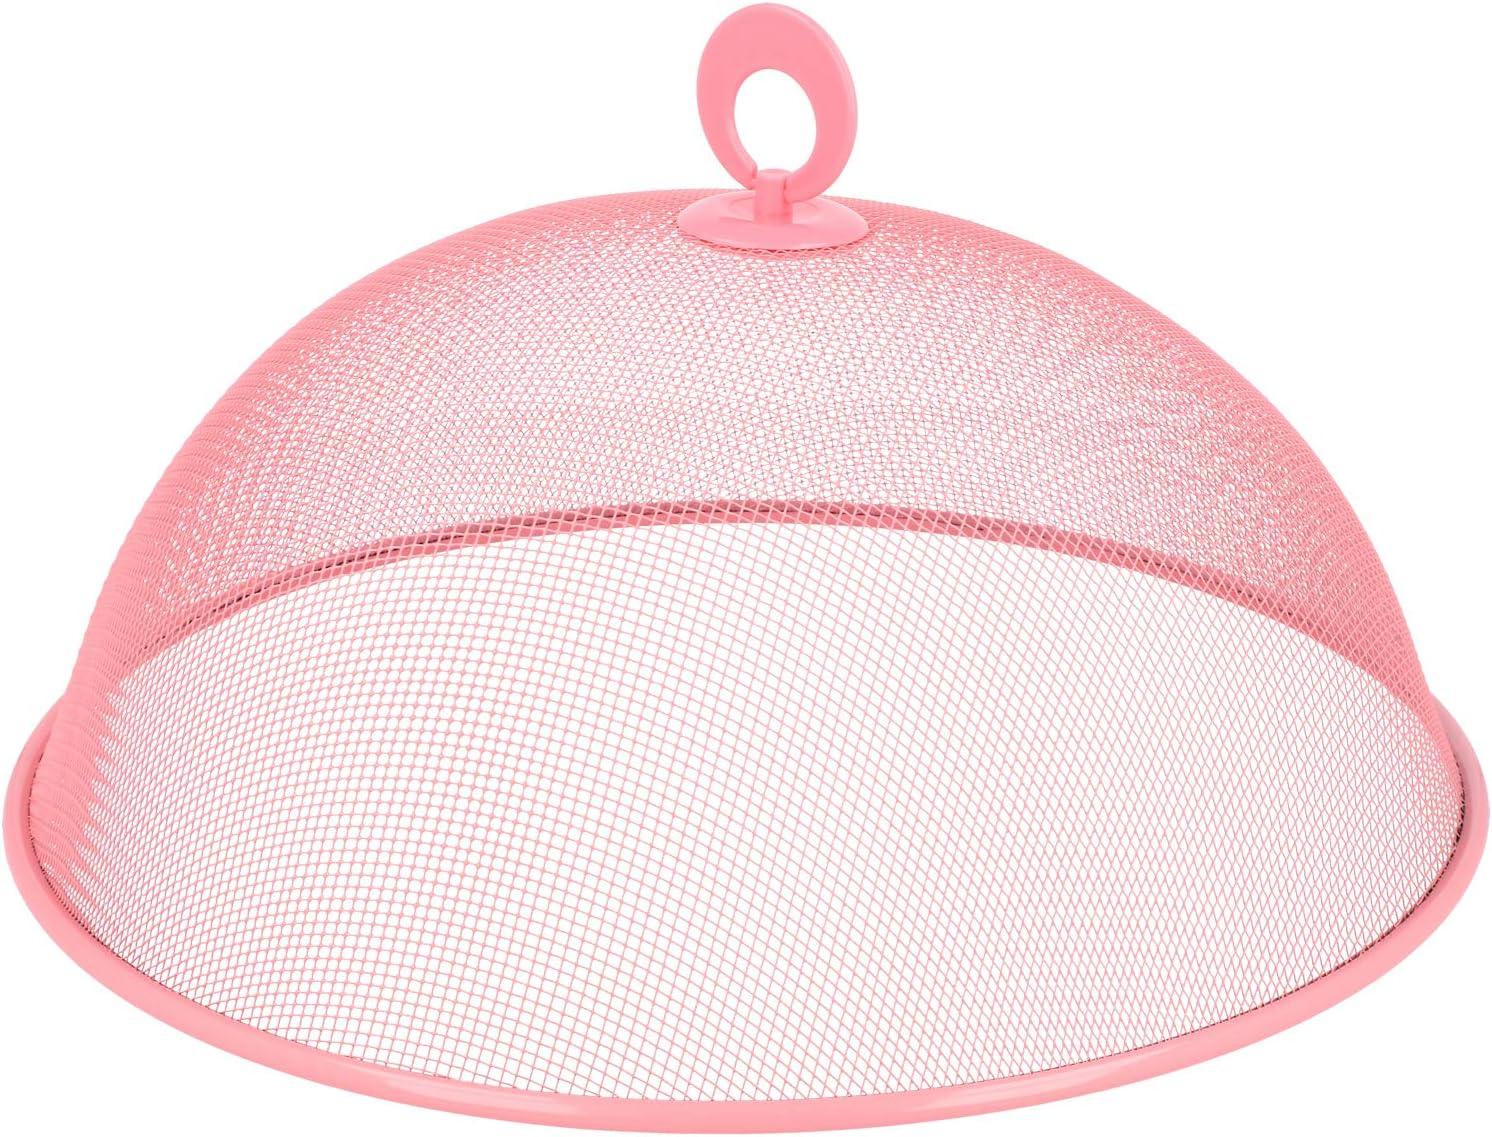 caperuza met/álica /Ø 30 cm COM-FOUR/® cubierta 2x para alimentos 02 piezas - rosa sombrilla de comedor colorida